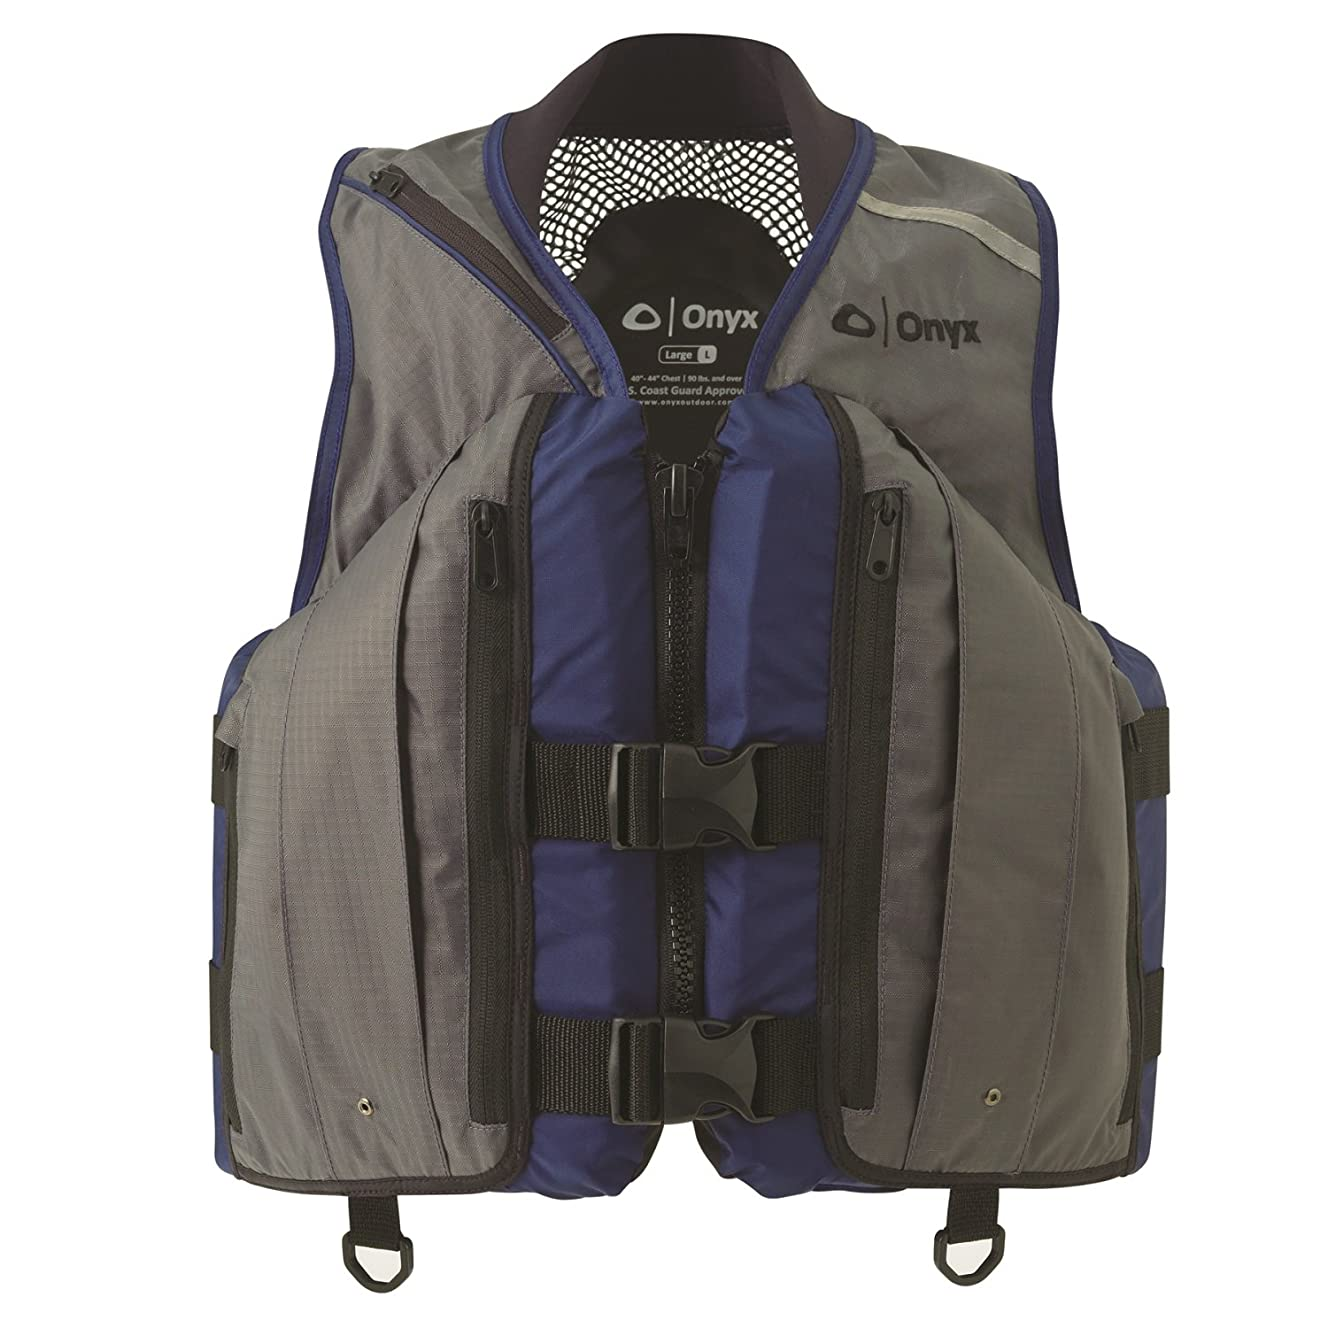 Onyx Mesh Deluxe Sport Vest - 3XL, Charcoal/Navy